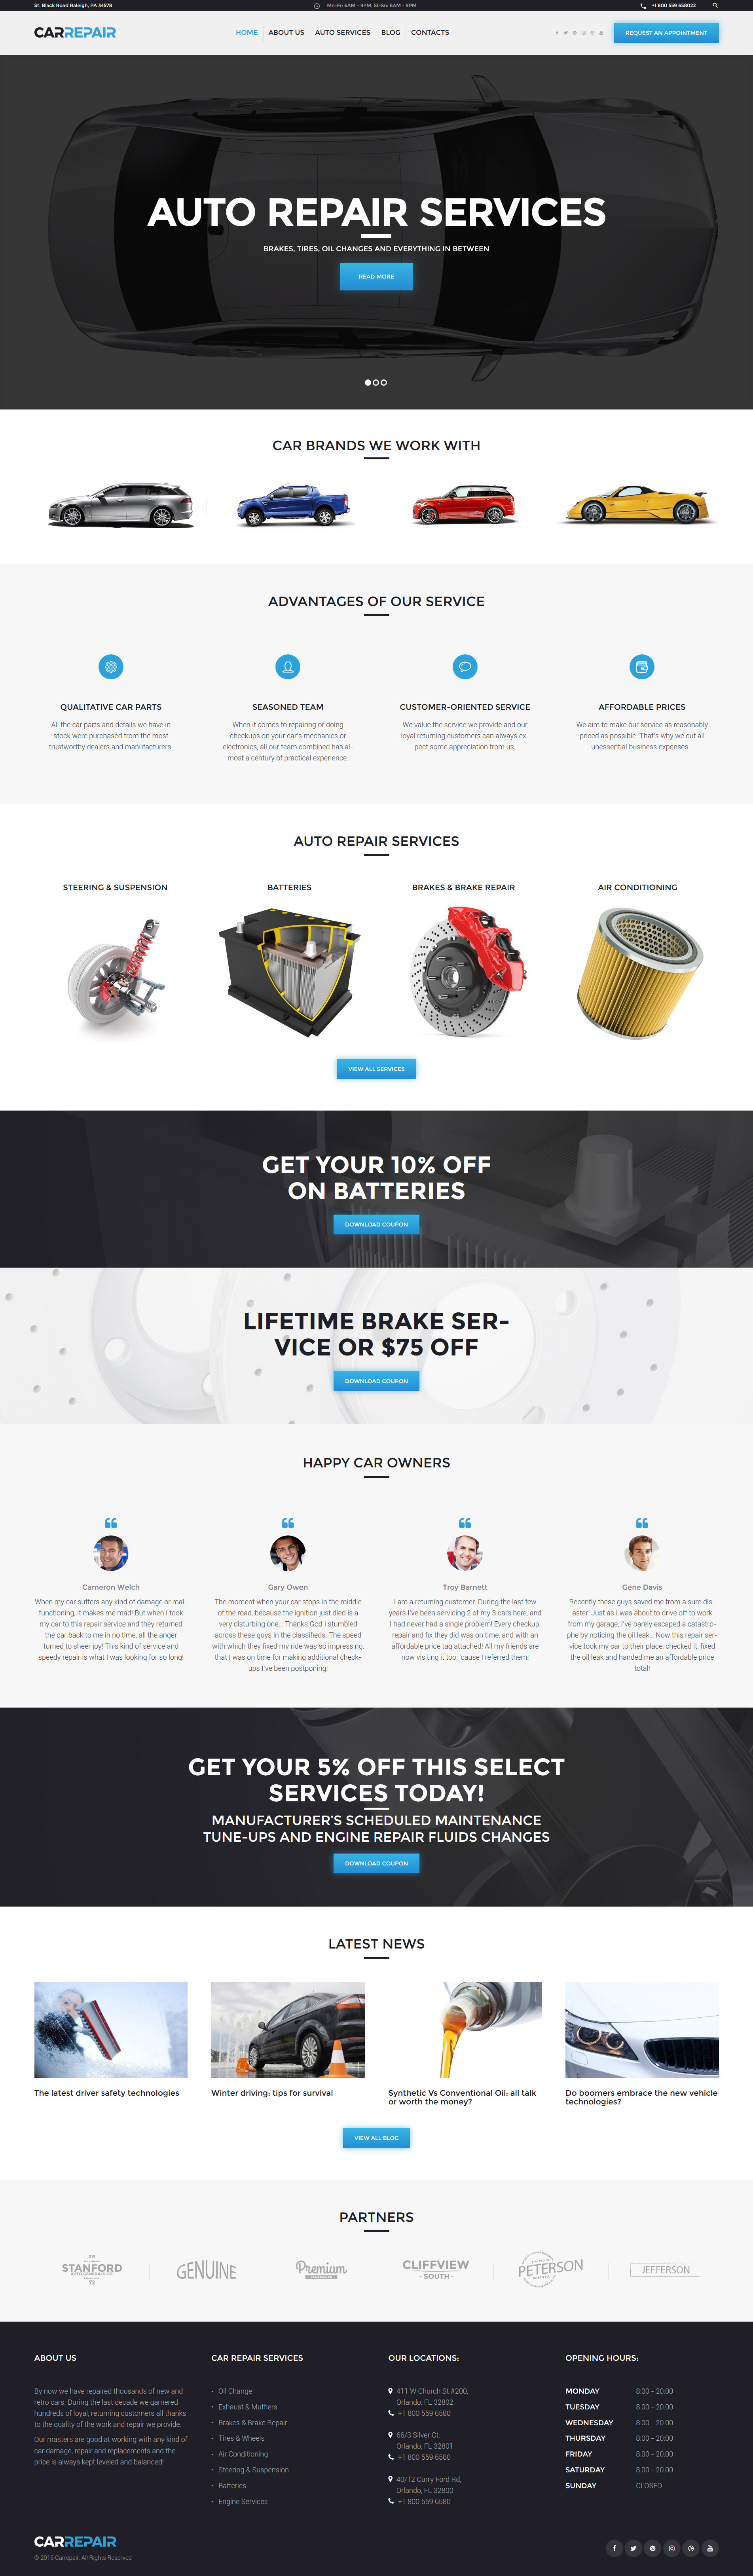 CarRepair - Auto Repair Services WordPress Theme - screenshot